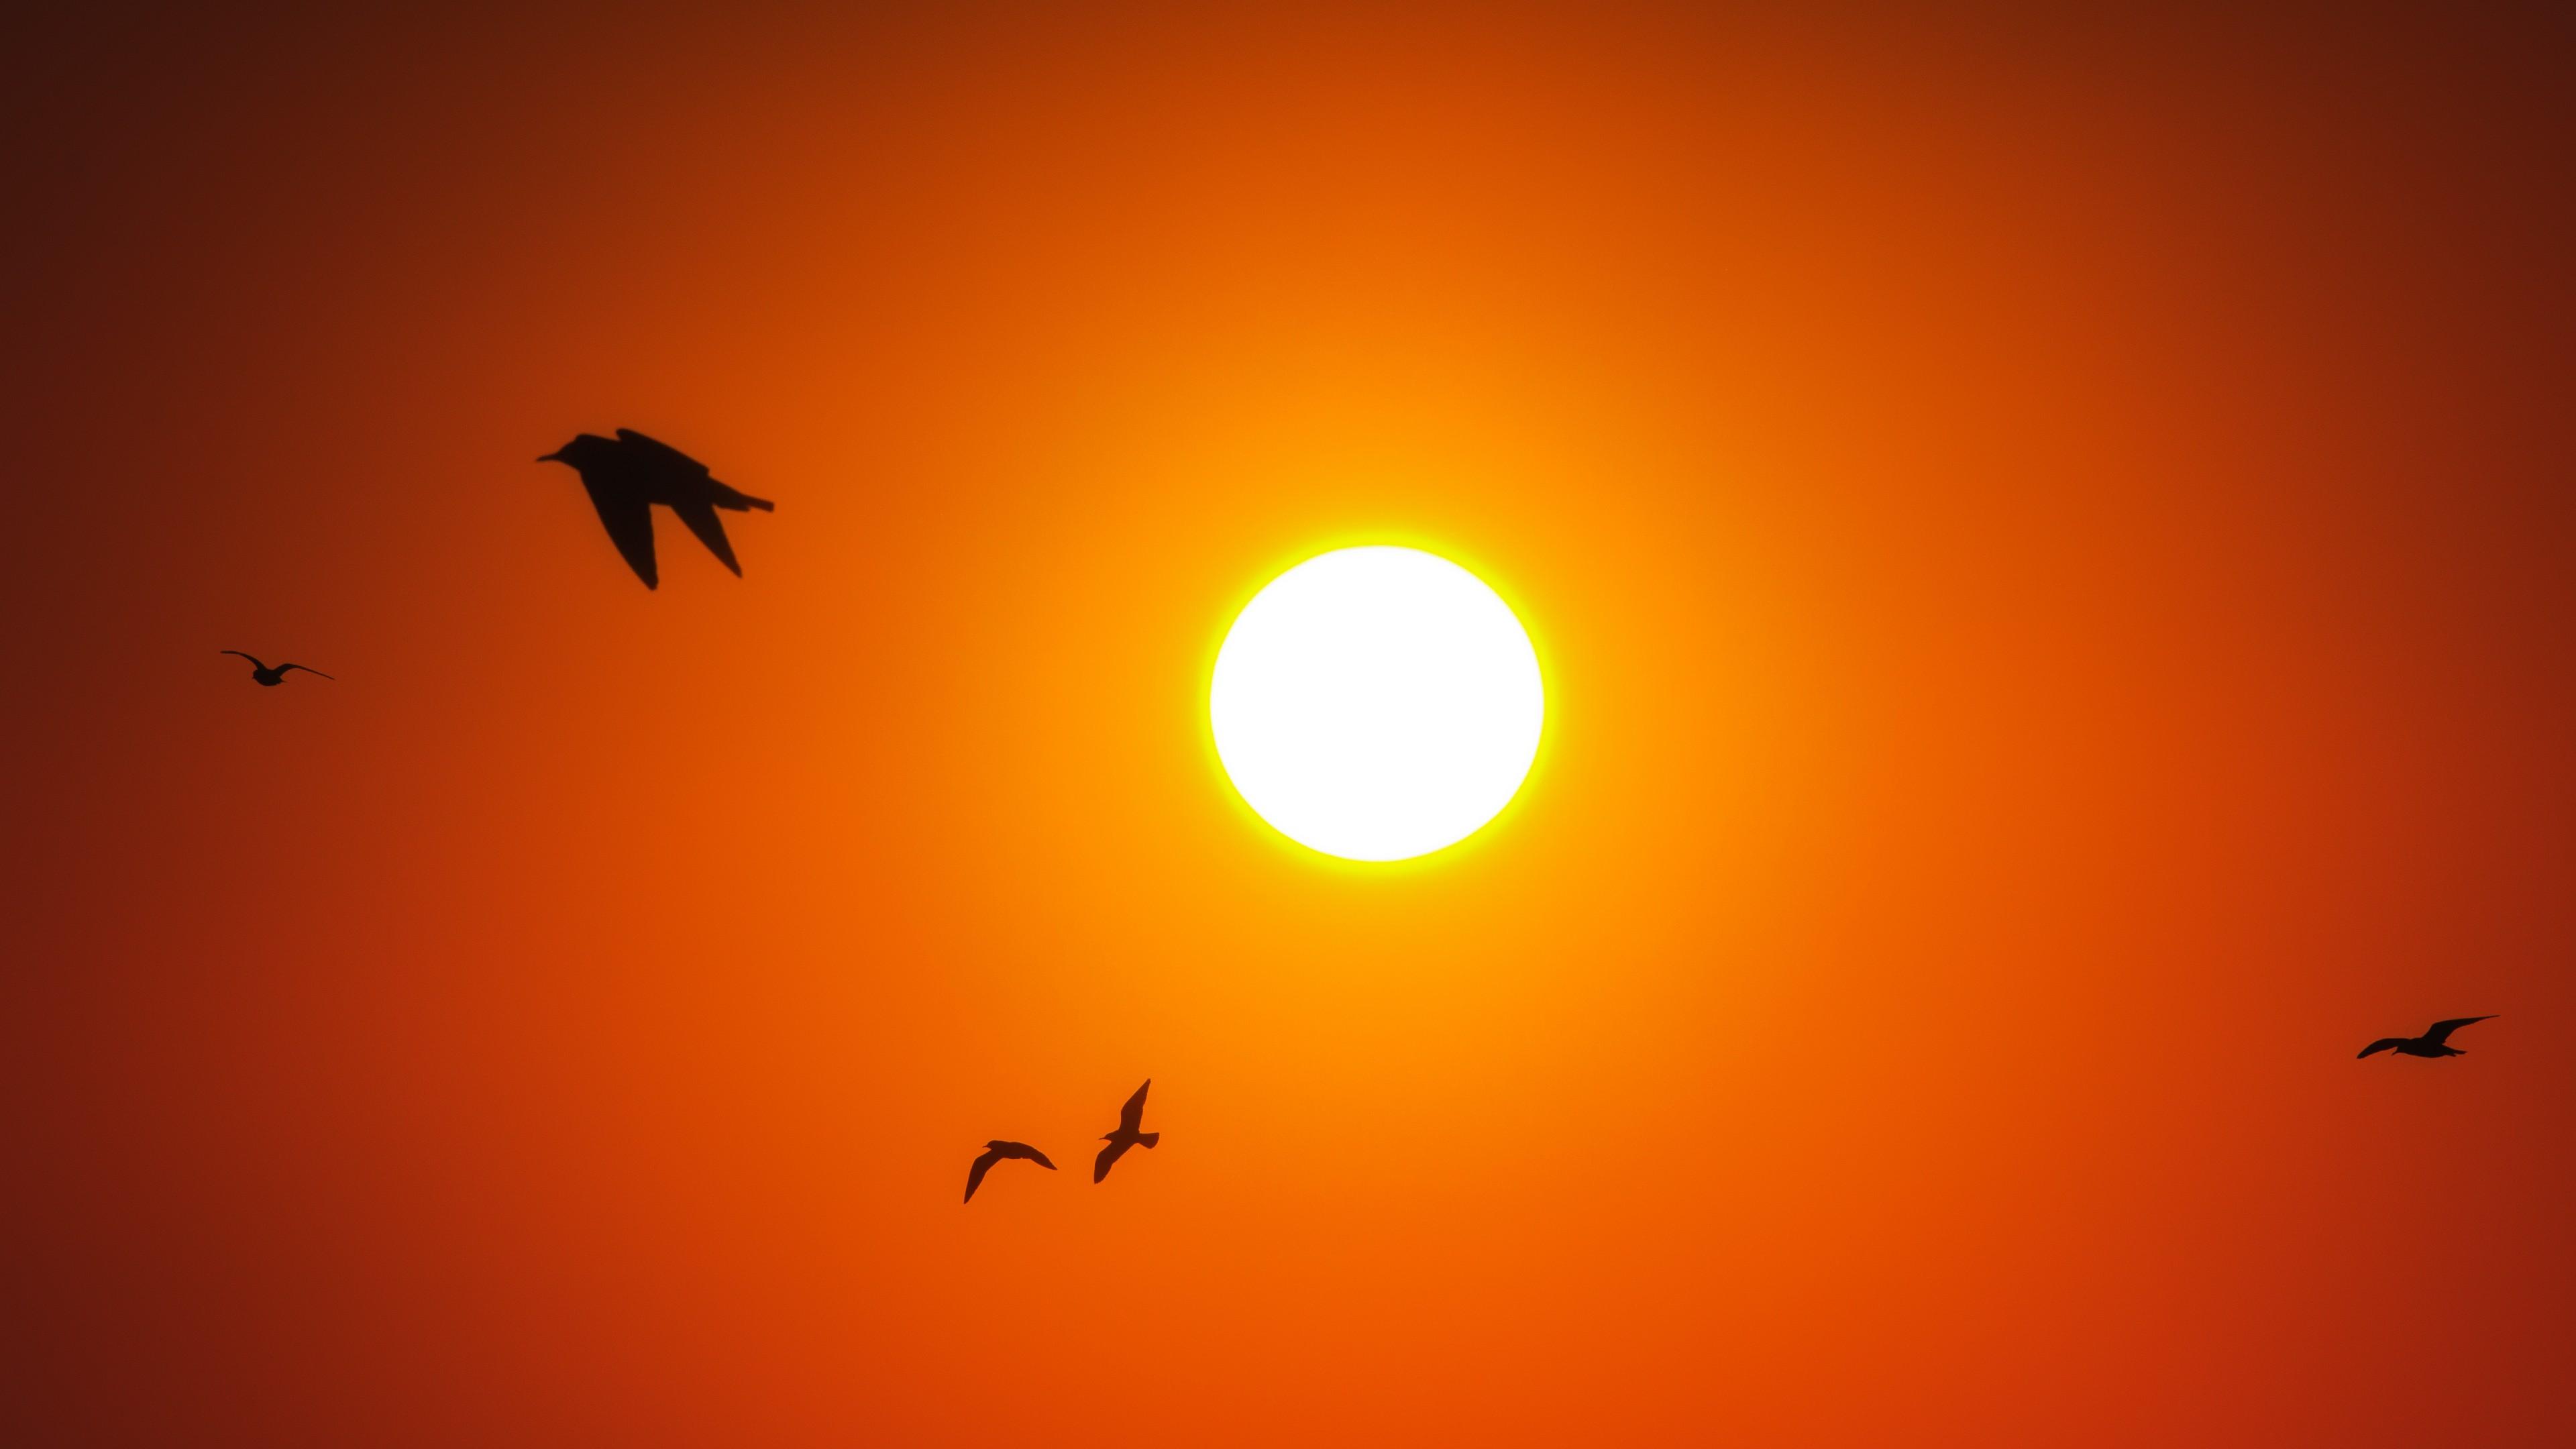 Iphone 5s Stock Wallpaper Sunrise Birds 4k Wallpapers Hd Wallpapers Id 18820